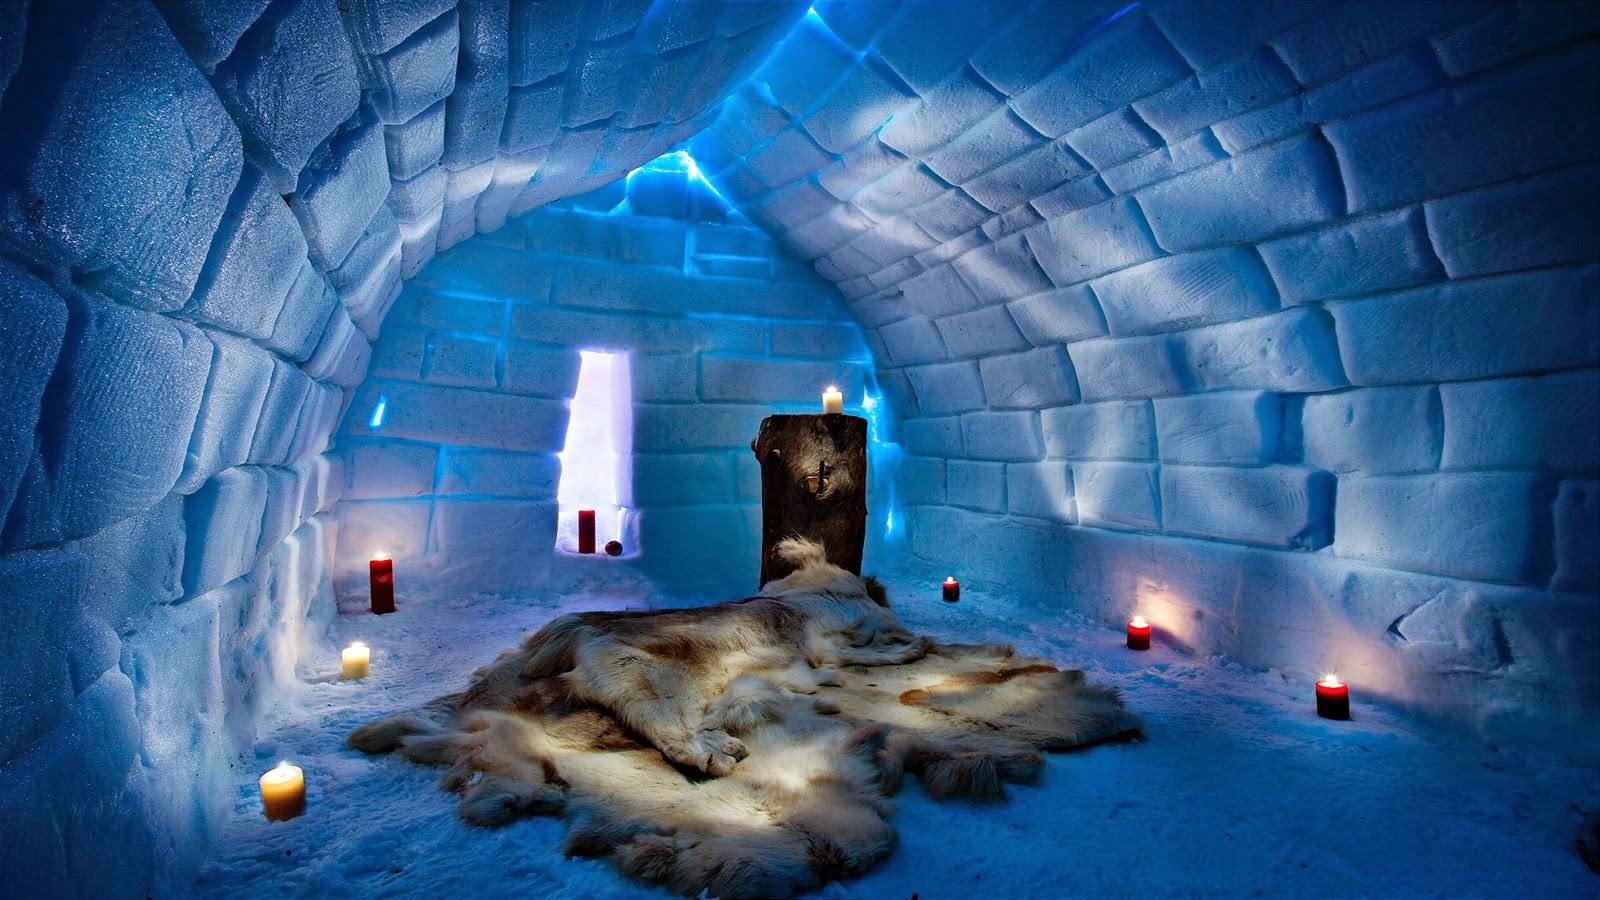 best winter vehicles 2015 autos post. Black Bedroom Furniture Sets. Home Design Ideas